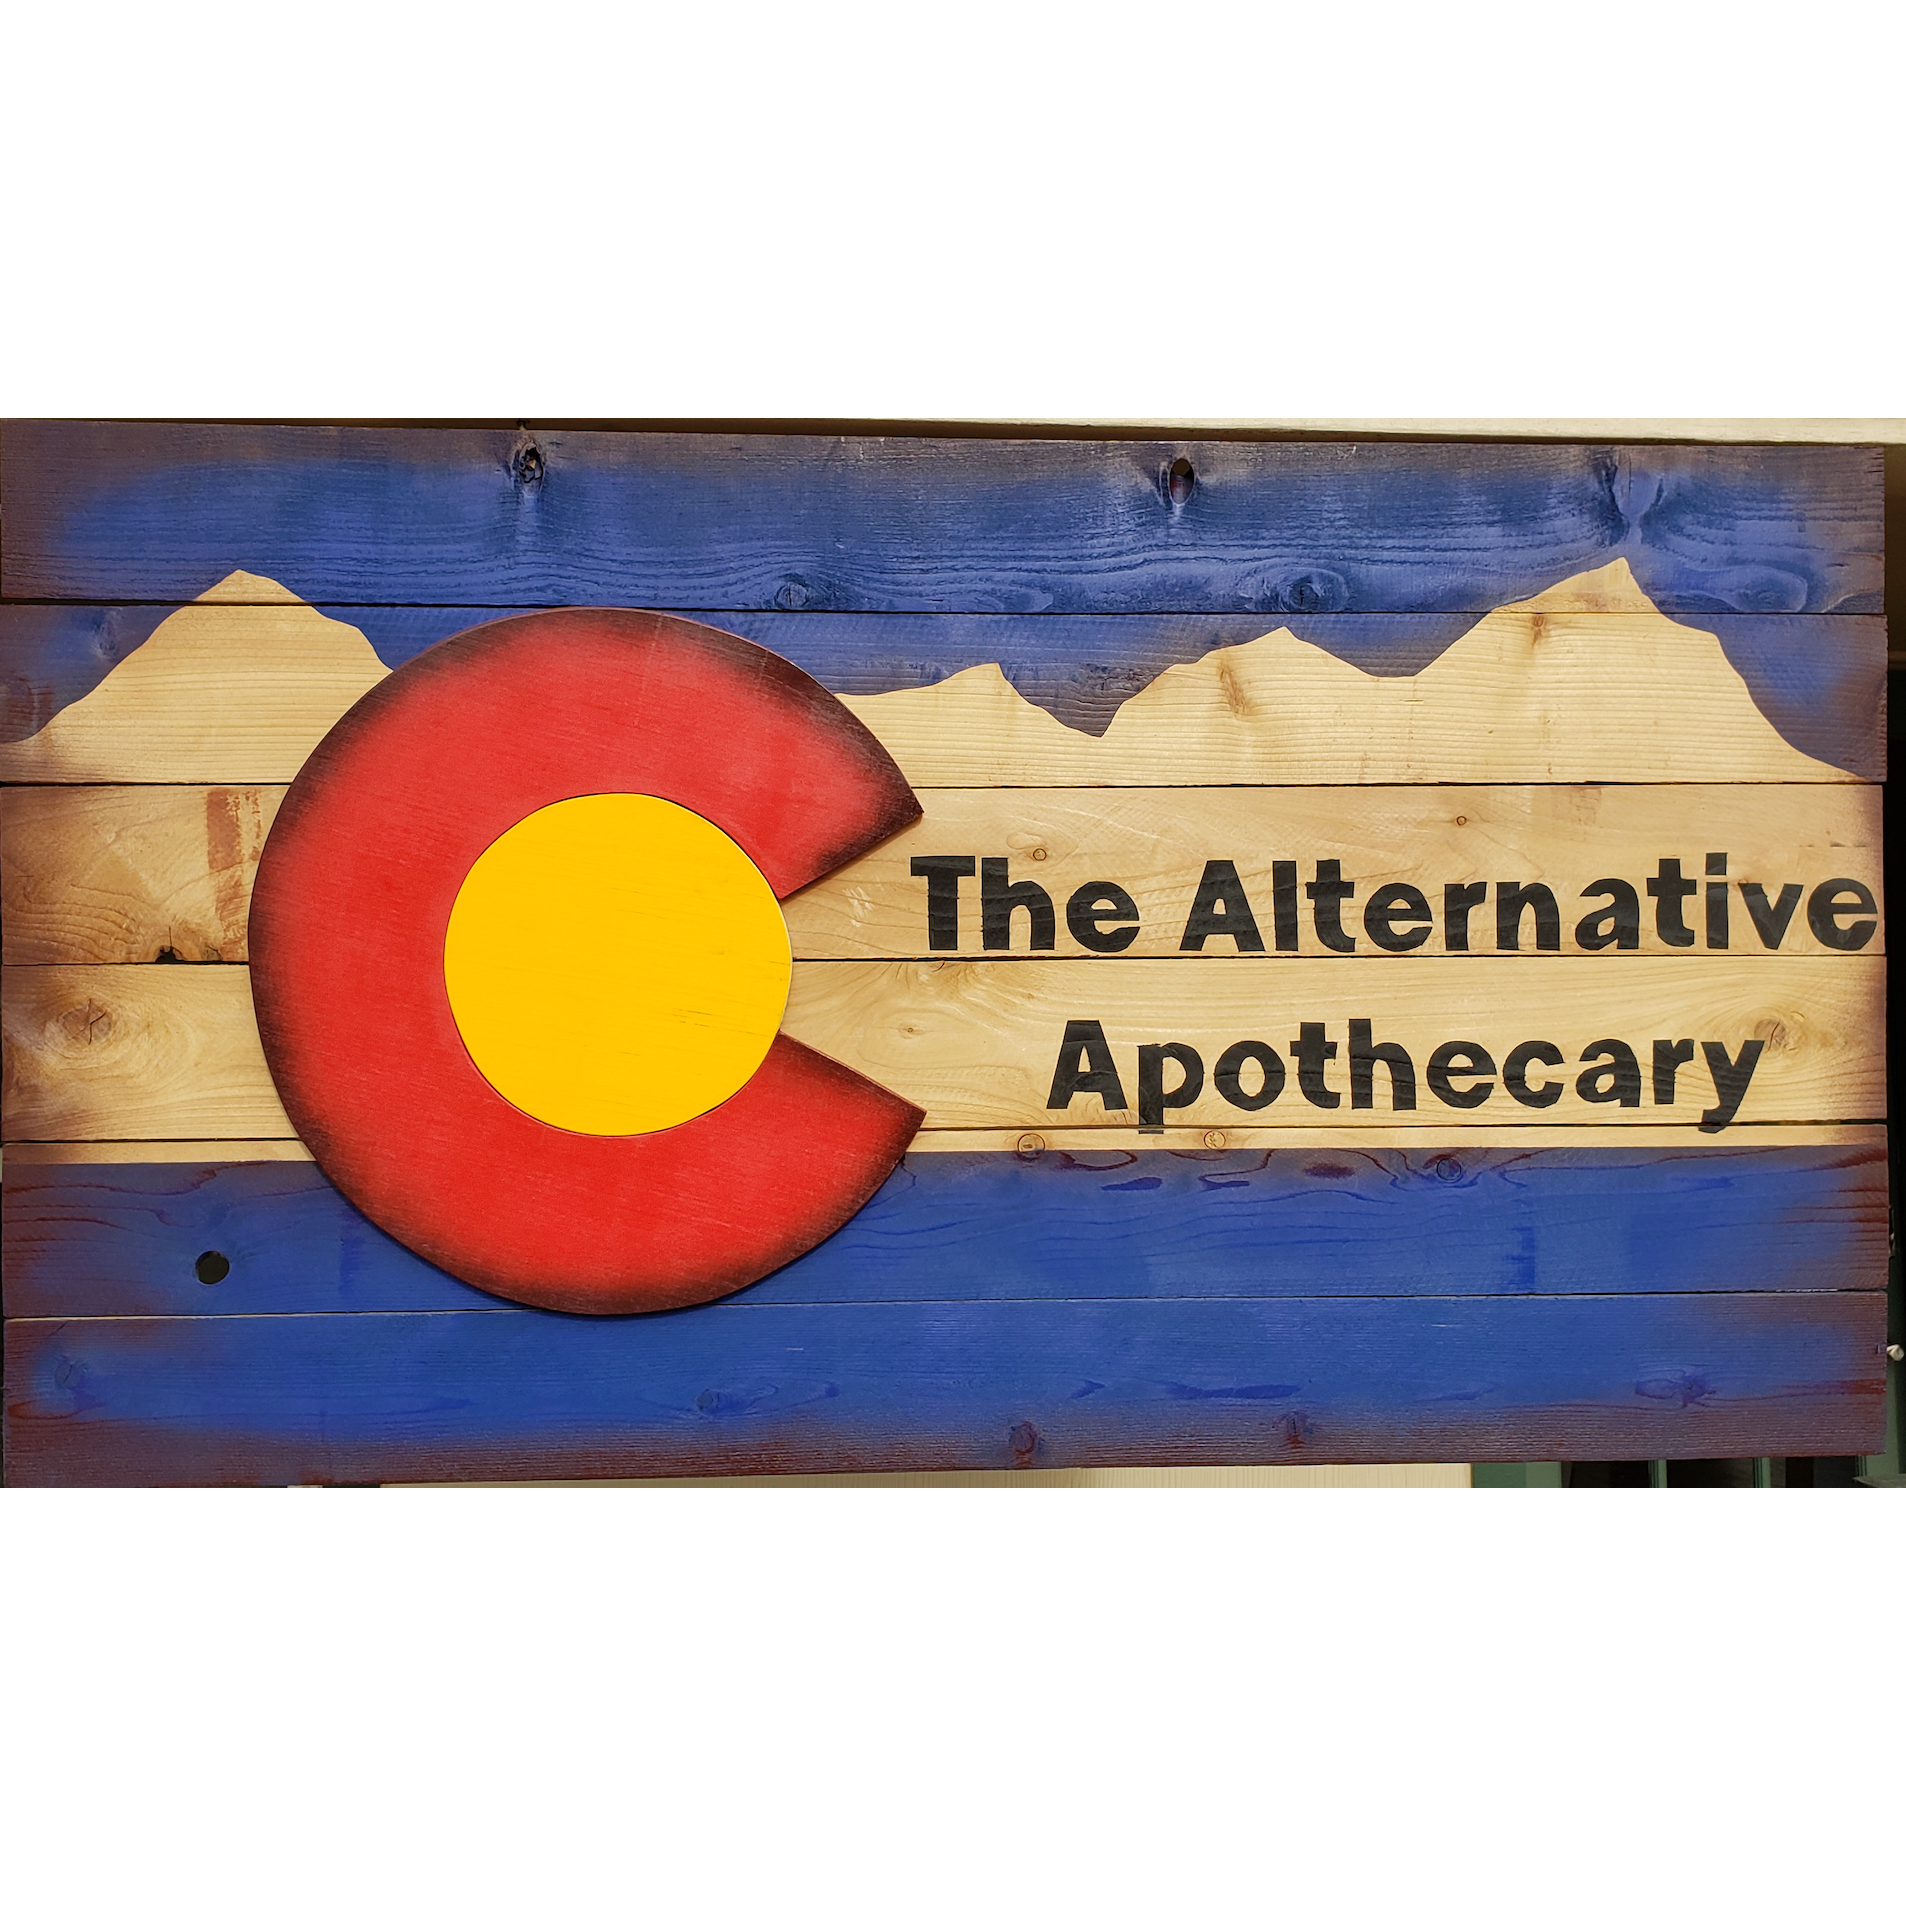 The Alternative Apothecary